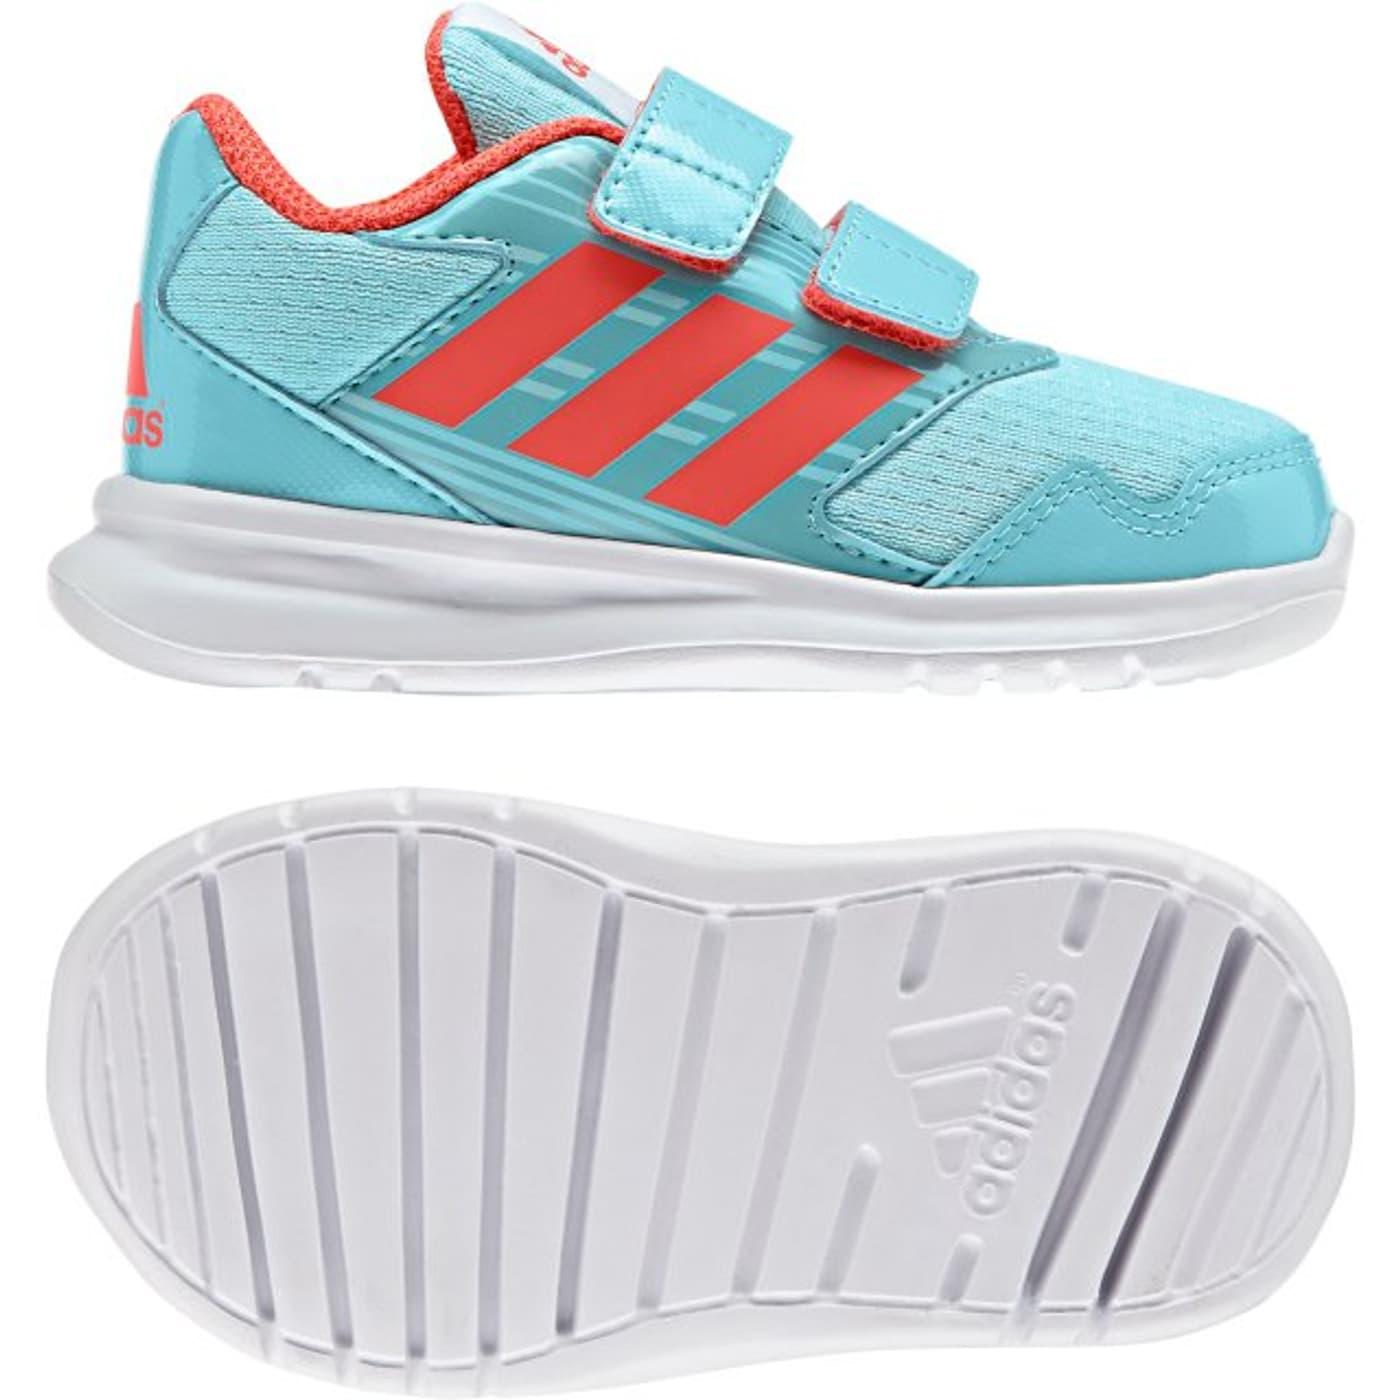 best website 79e58 55f65 Run Running Alta Migros Bambino Cf Da Adidas Scarpa I fxCSPw5xTq